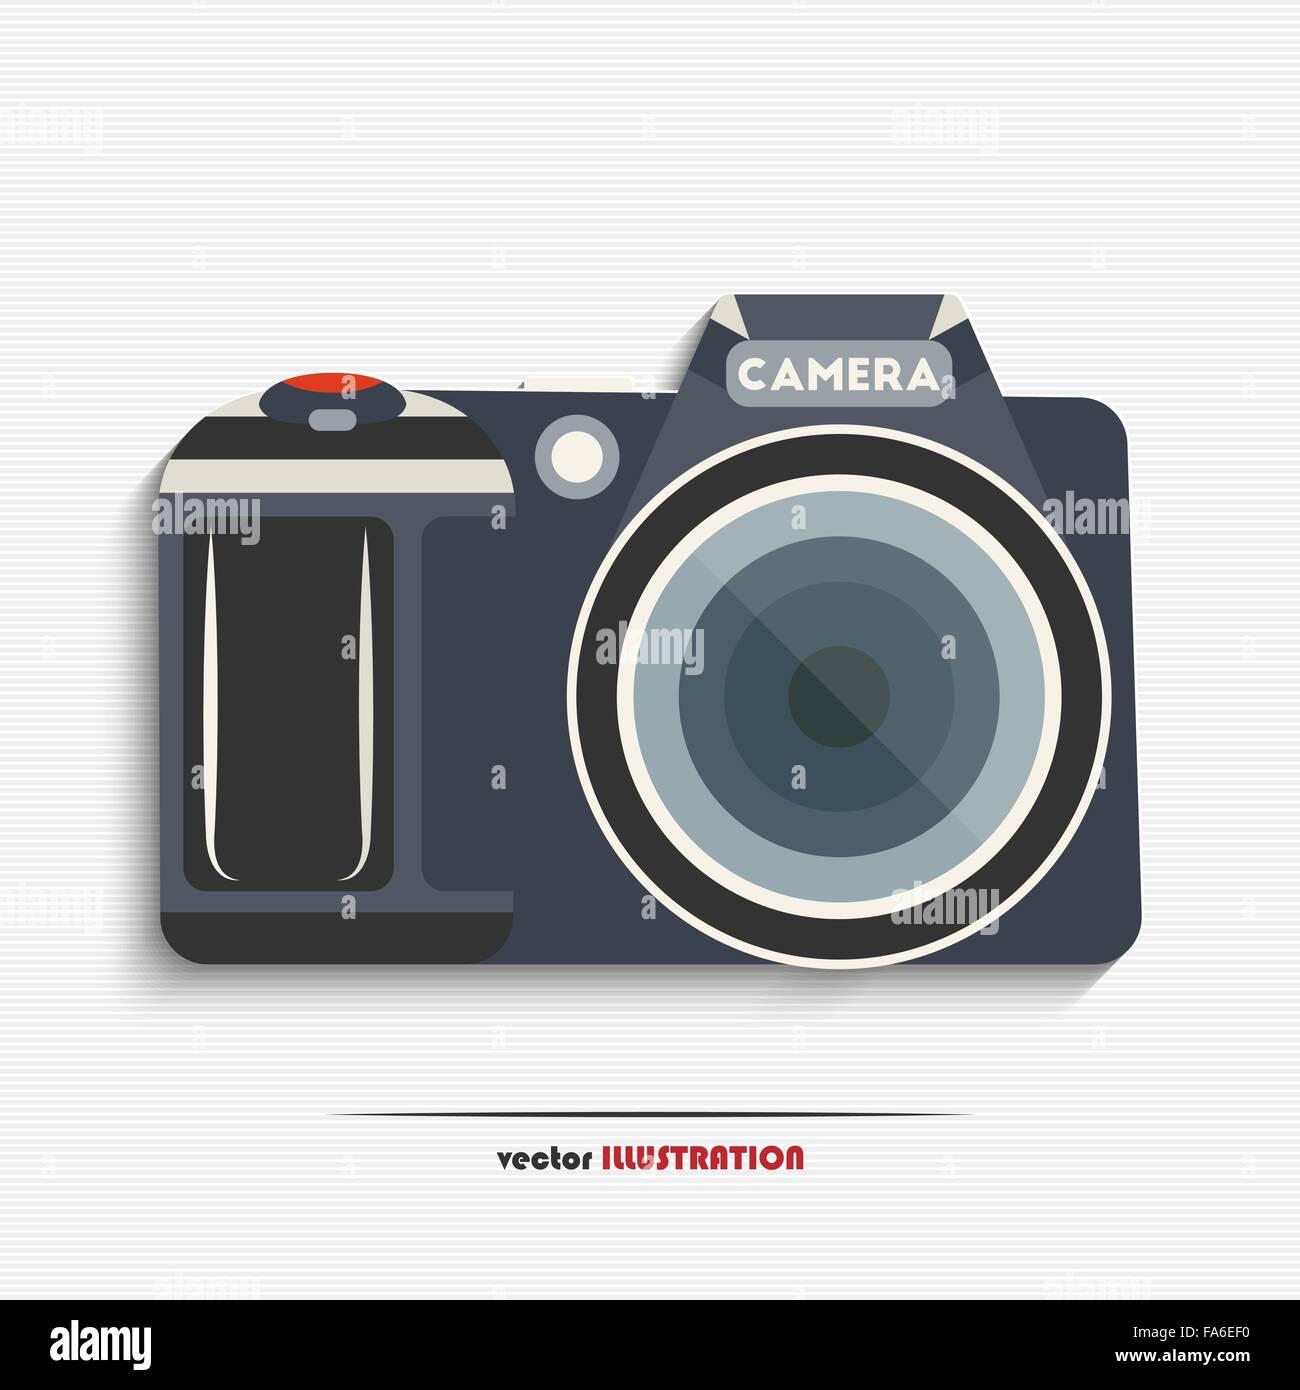 Vector illustration of digital SLR camera for your design - Stock Vector